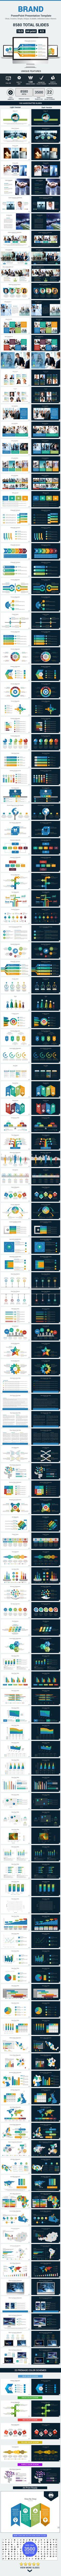 Brand PowerPoint Presentation Template (PowerPoint Templates)